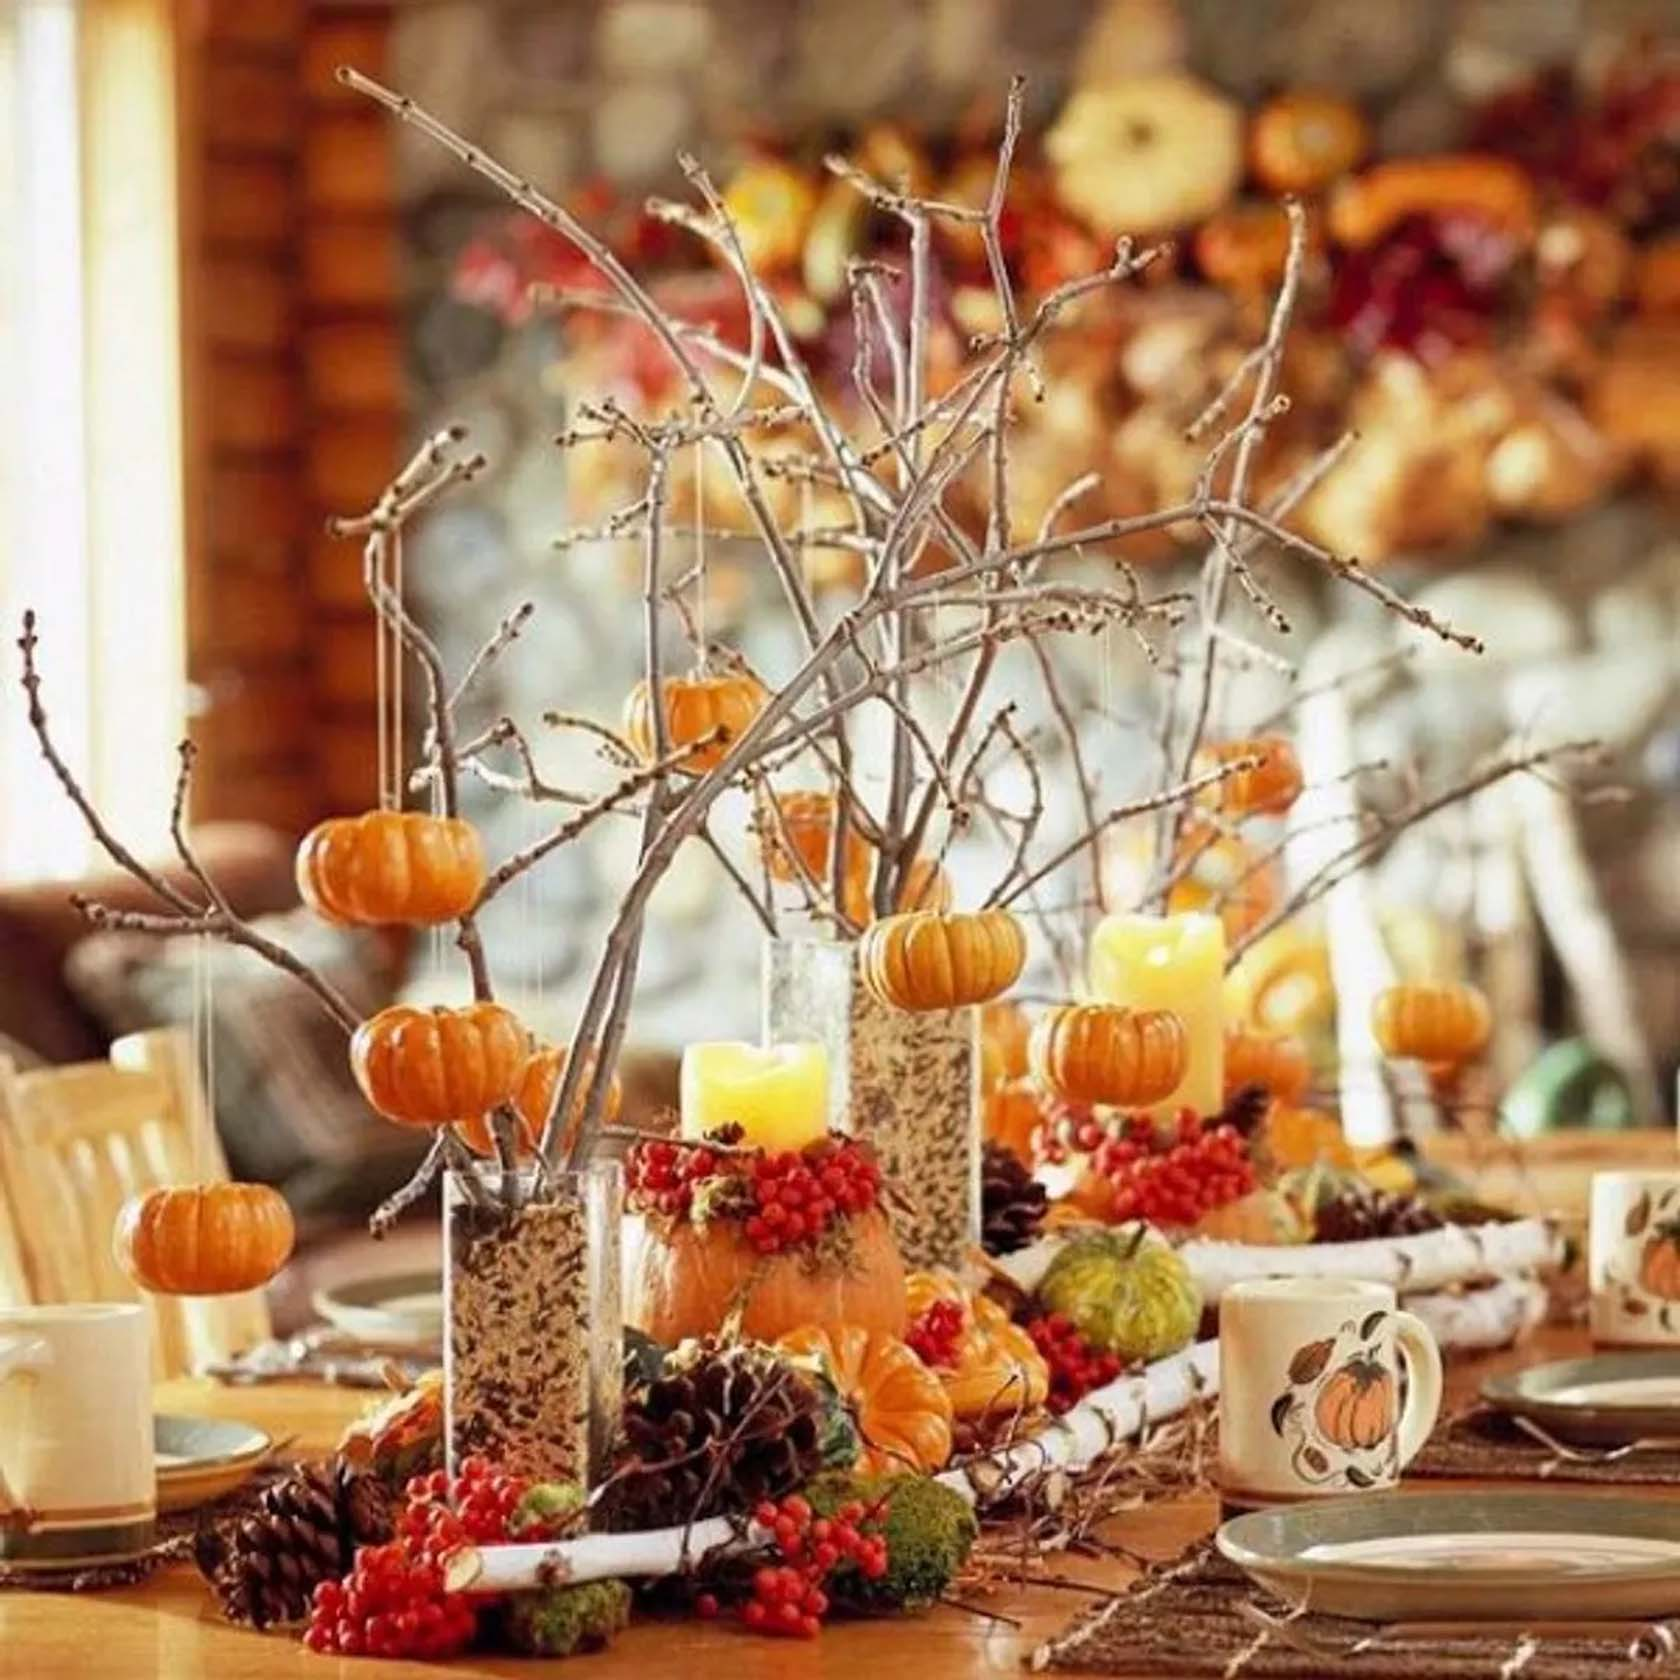 Home Decor Ideas For Thanksgiving